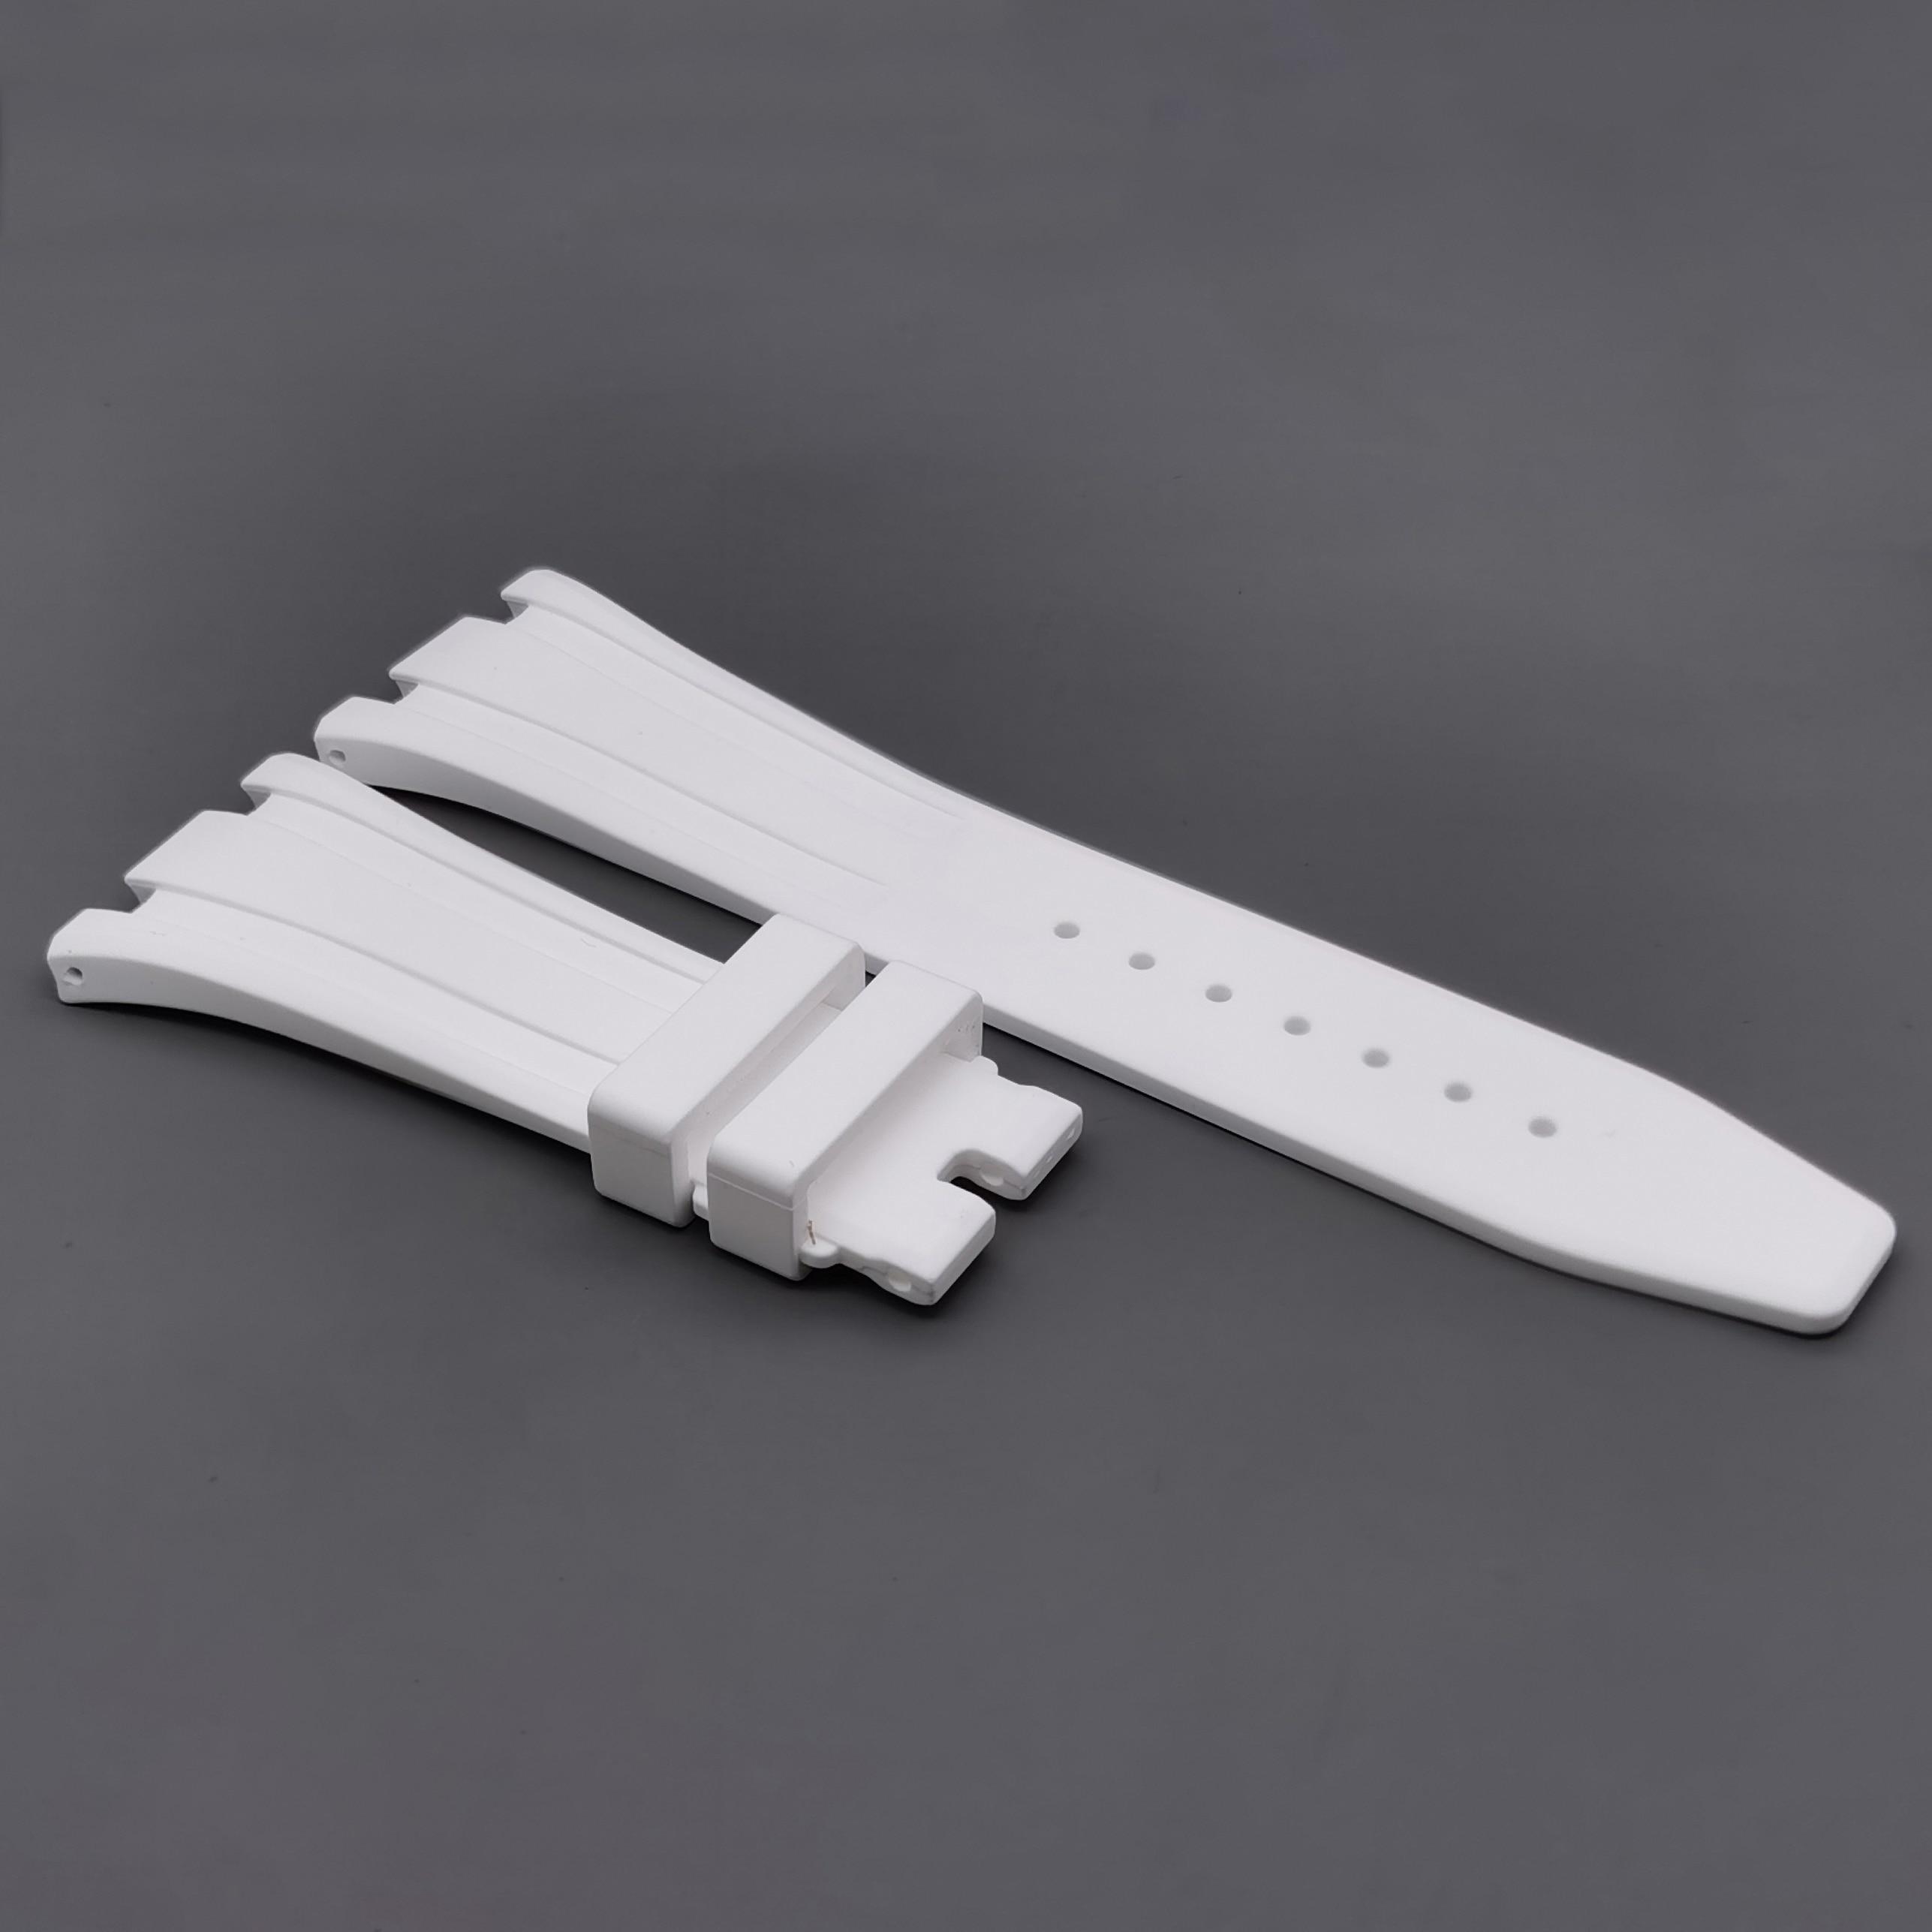 GA2100 Metal Bezel Modification 3rd Generation Rubber Watchstrap GA-2100/2110 Stainless Steel Tools Screws Casioak mod enlarge